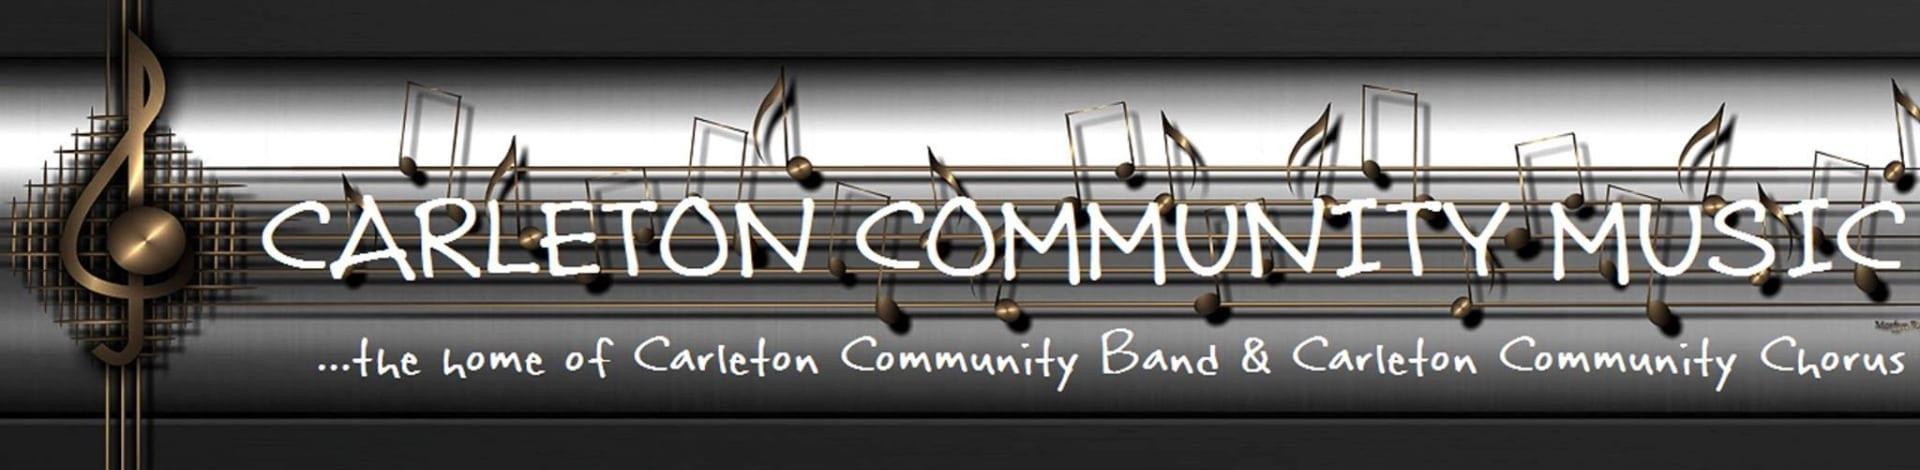 Carleton Community Music